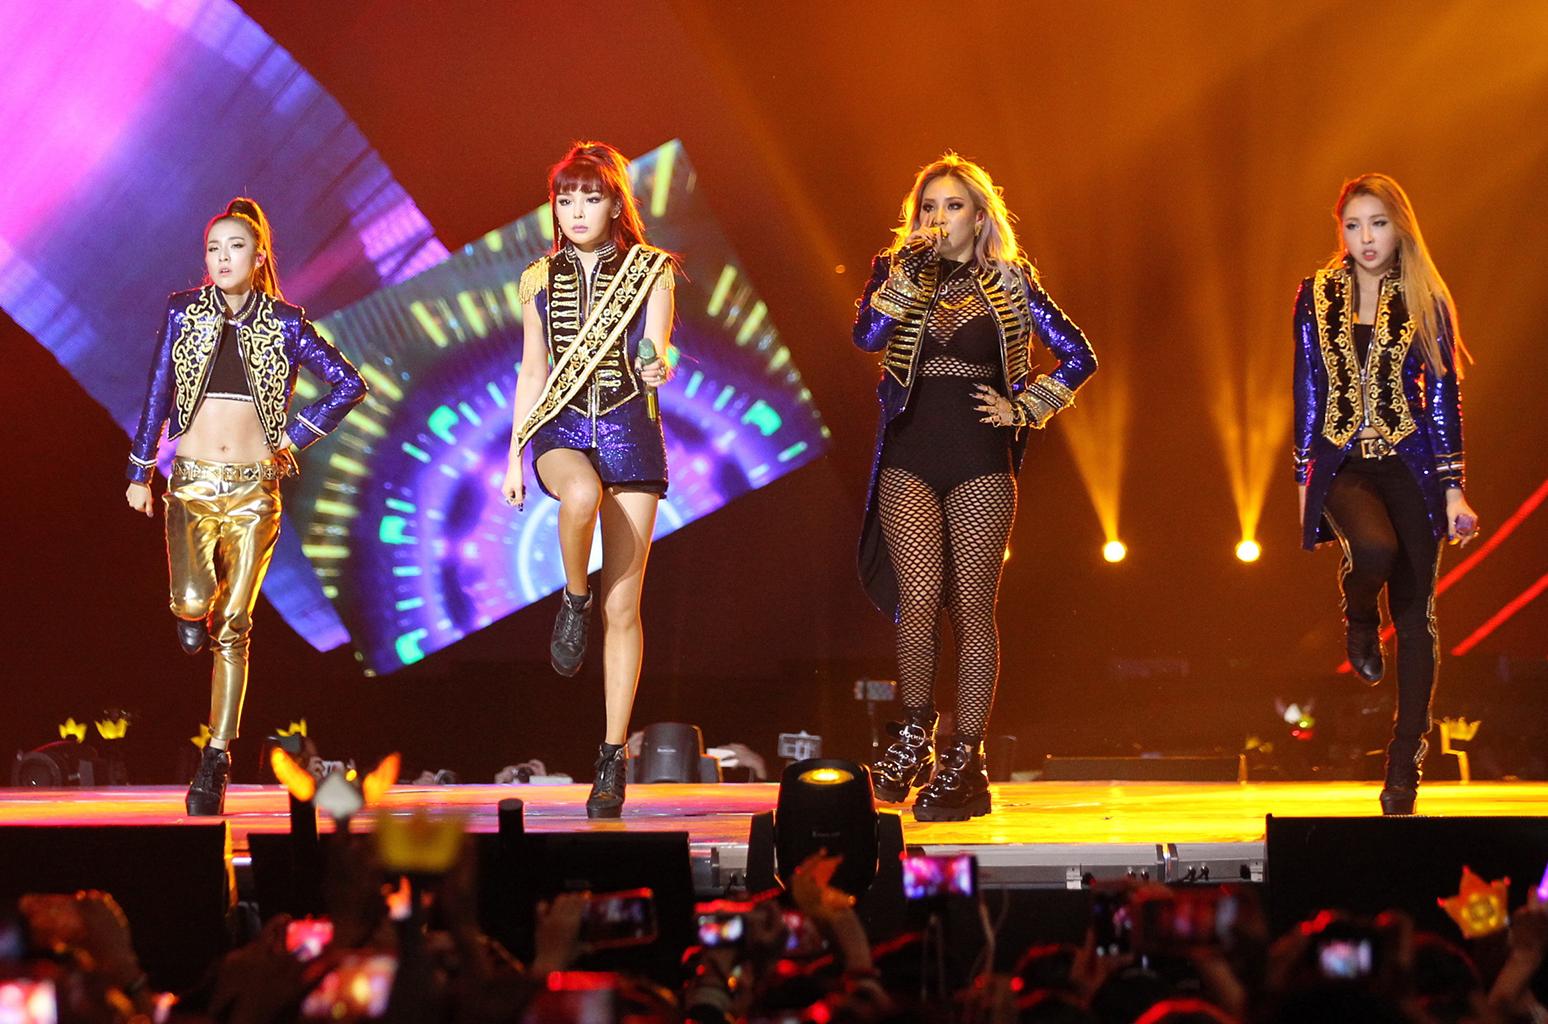 2NE1, 2NE1 tái hợp trên BXH Billboard, CL, Park Bom, Sandara Park, Minzy